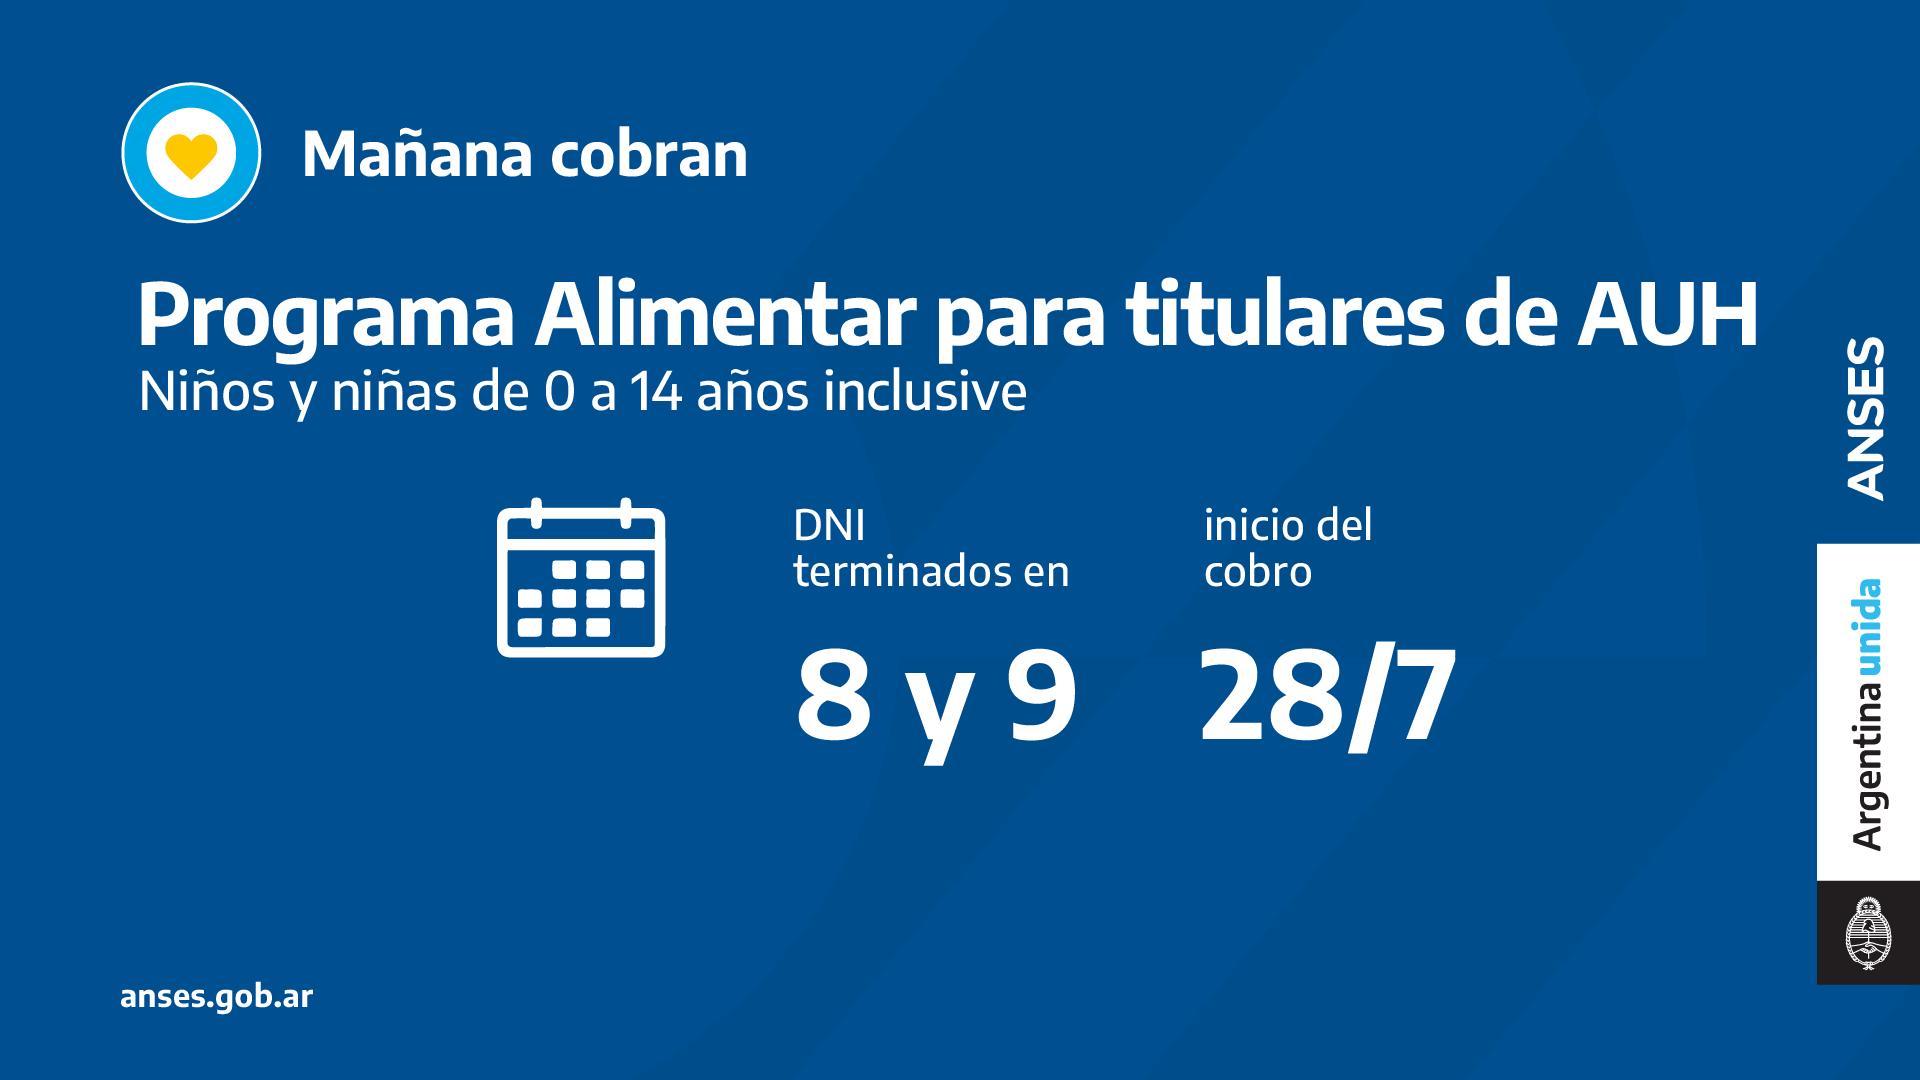 ANSES: CALENDARIOS DE PAGO DEL MIÉRCOLES 28 DE JULIO